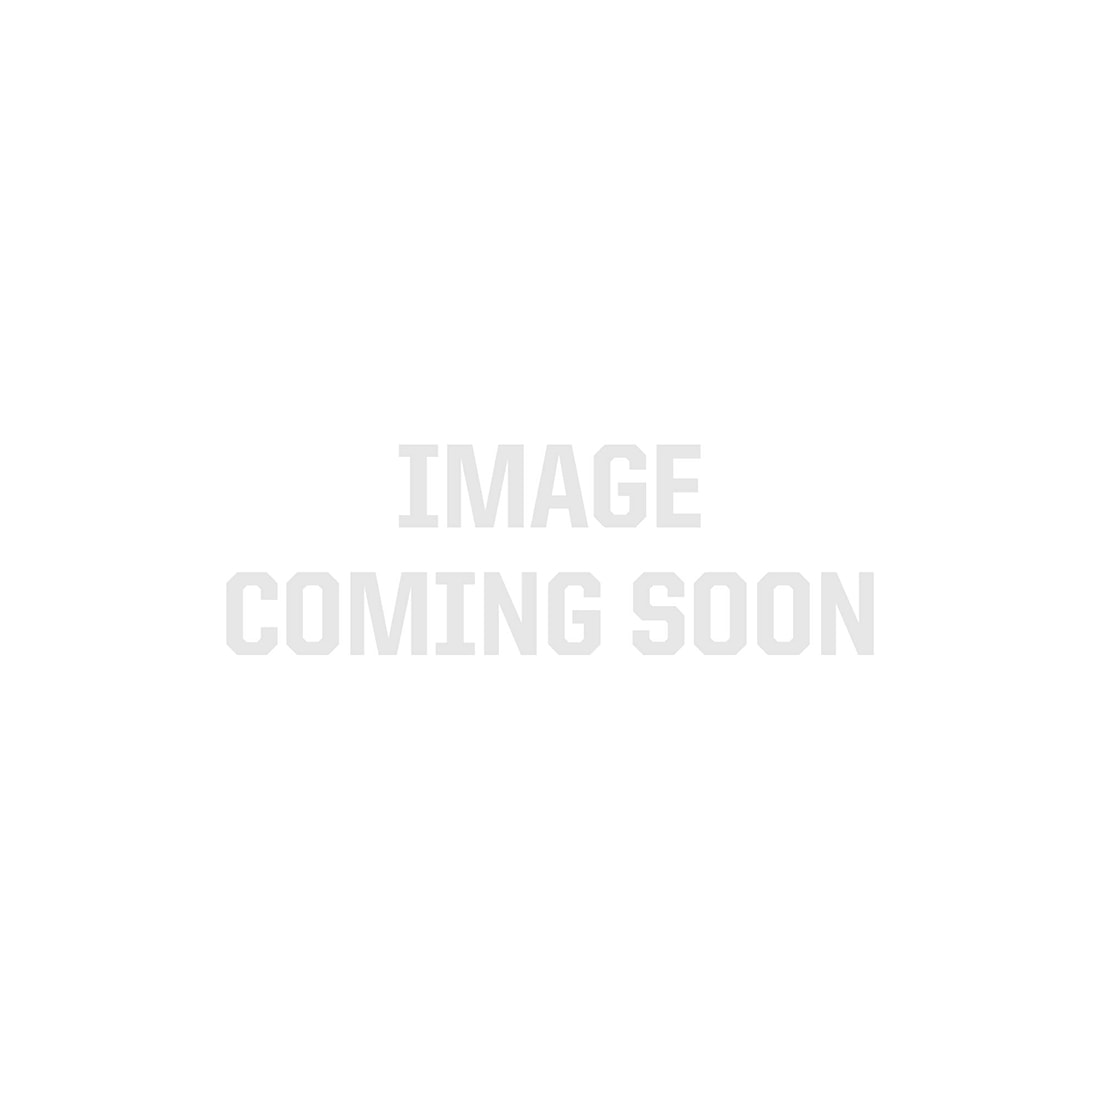 S14 Frosted Glass Dimmable LED Light Bulb, E26 (Medium) Base, 1.4 watt (Red)